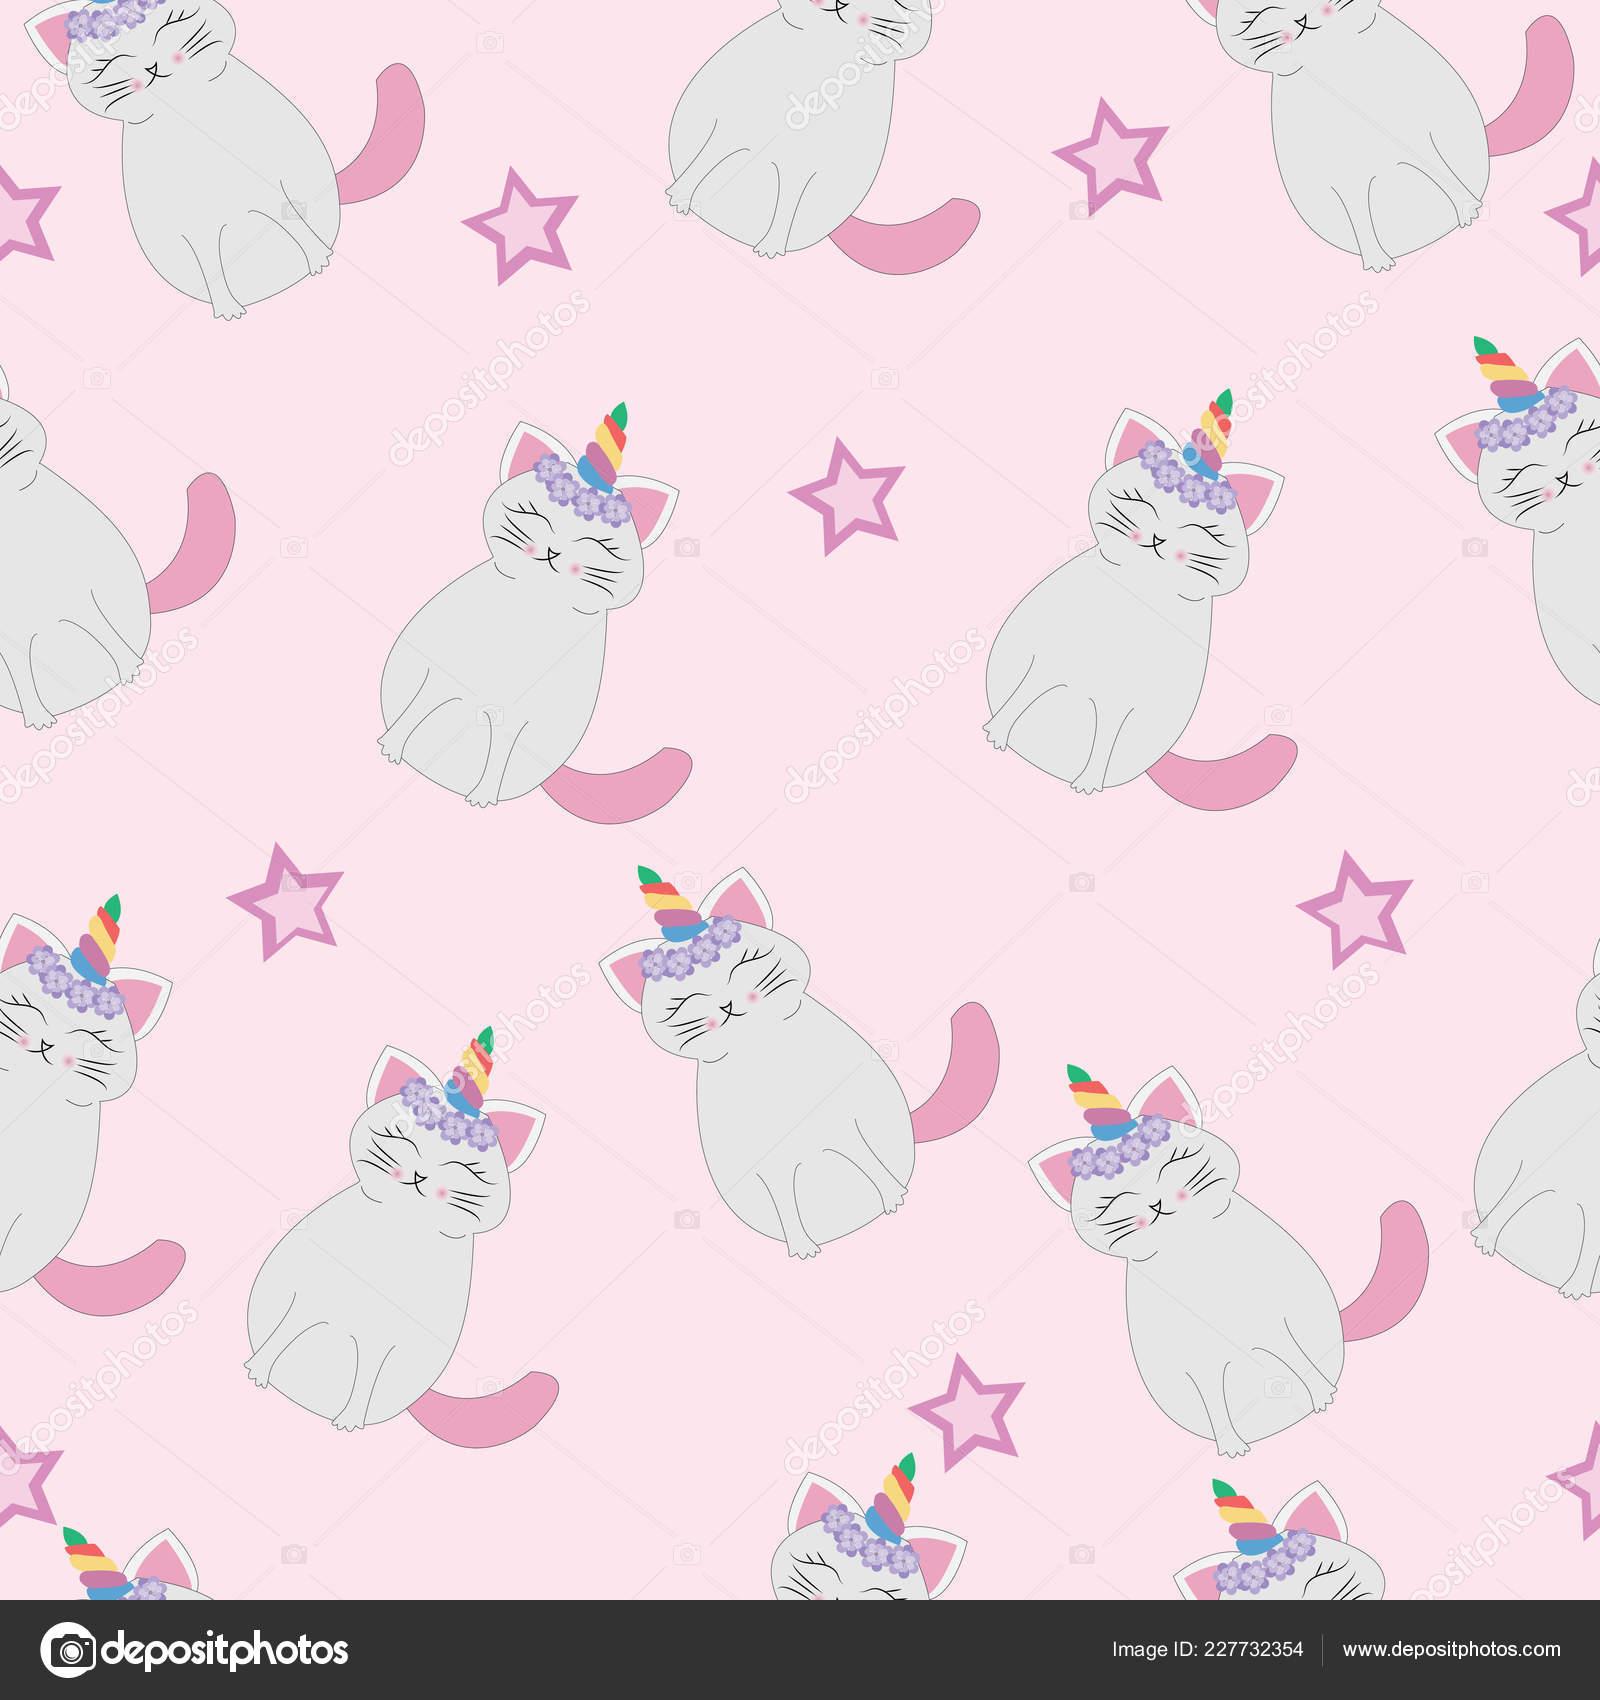 Cute Cats Unicorn Caticorn Seamless Pattern Cartoon Vector